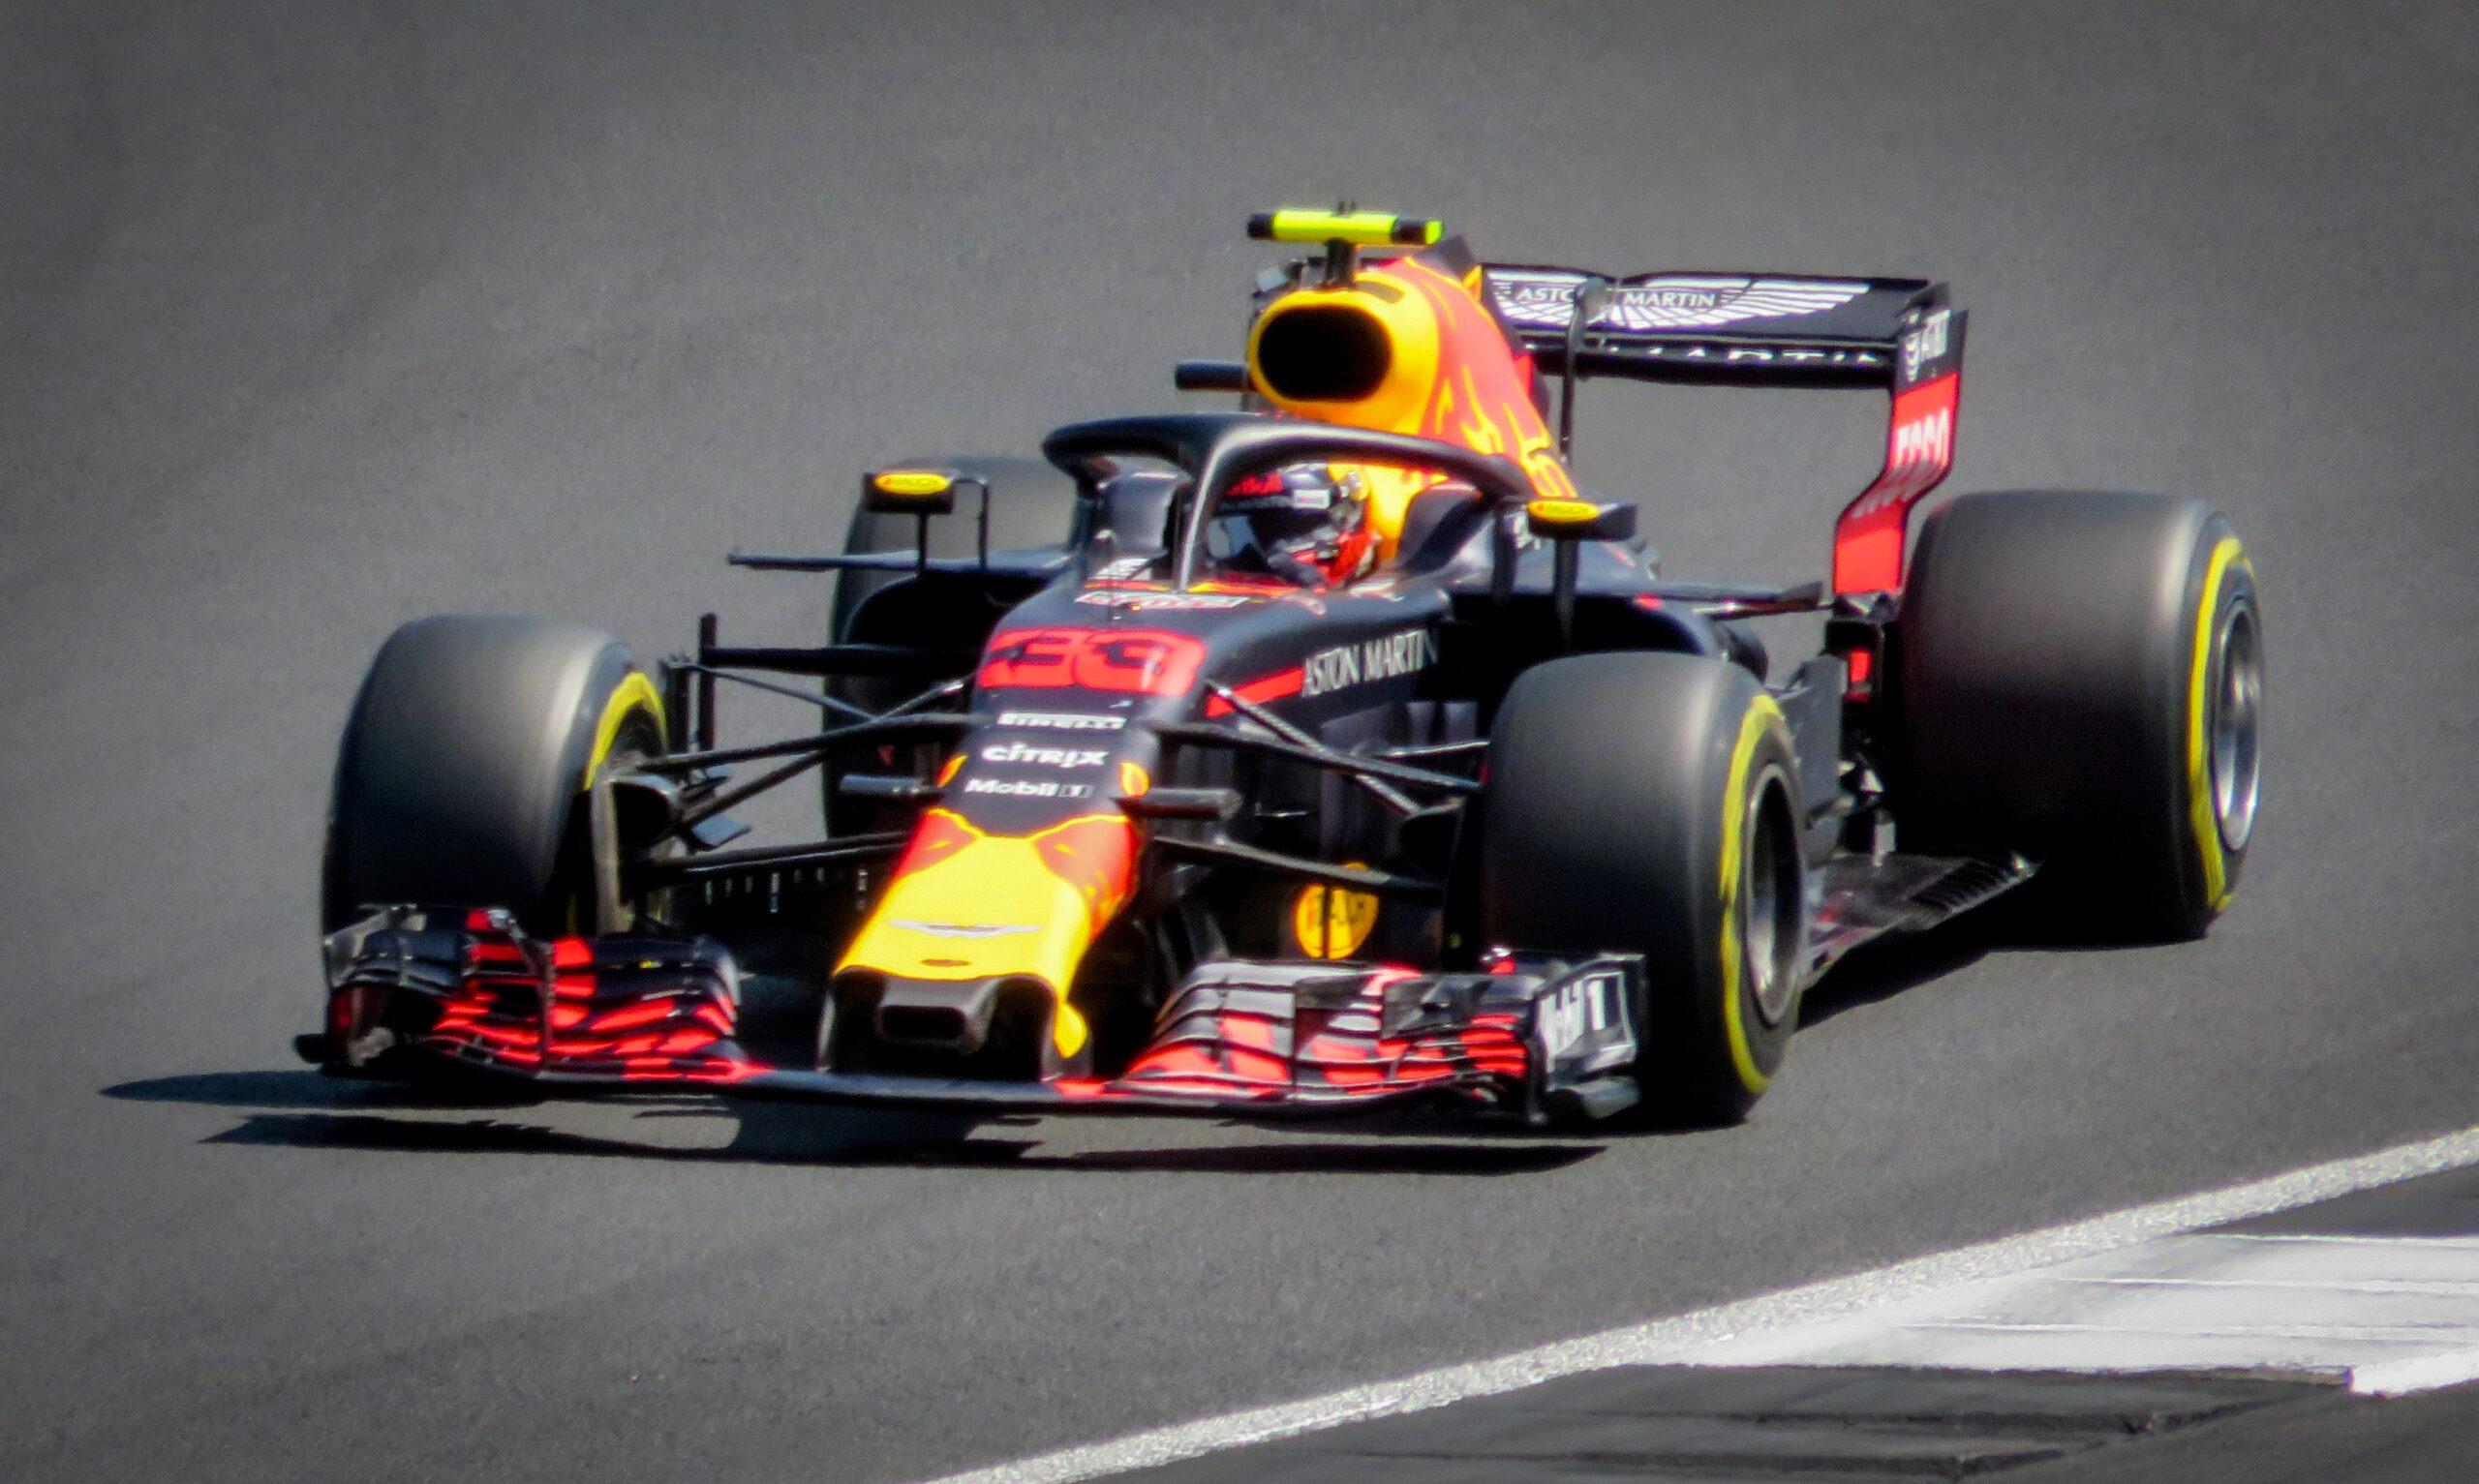 Max Verstappen Formule Grand Prix Oostenrijk live stream (Foto Wikimedia Commons)